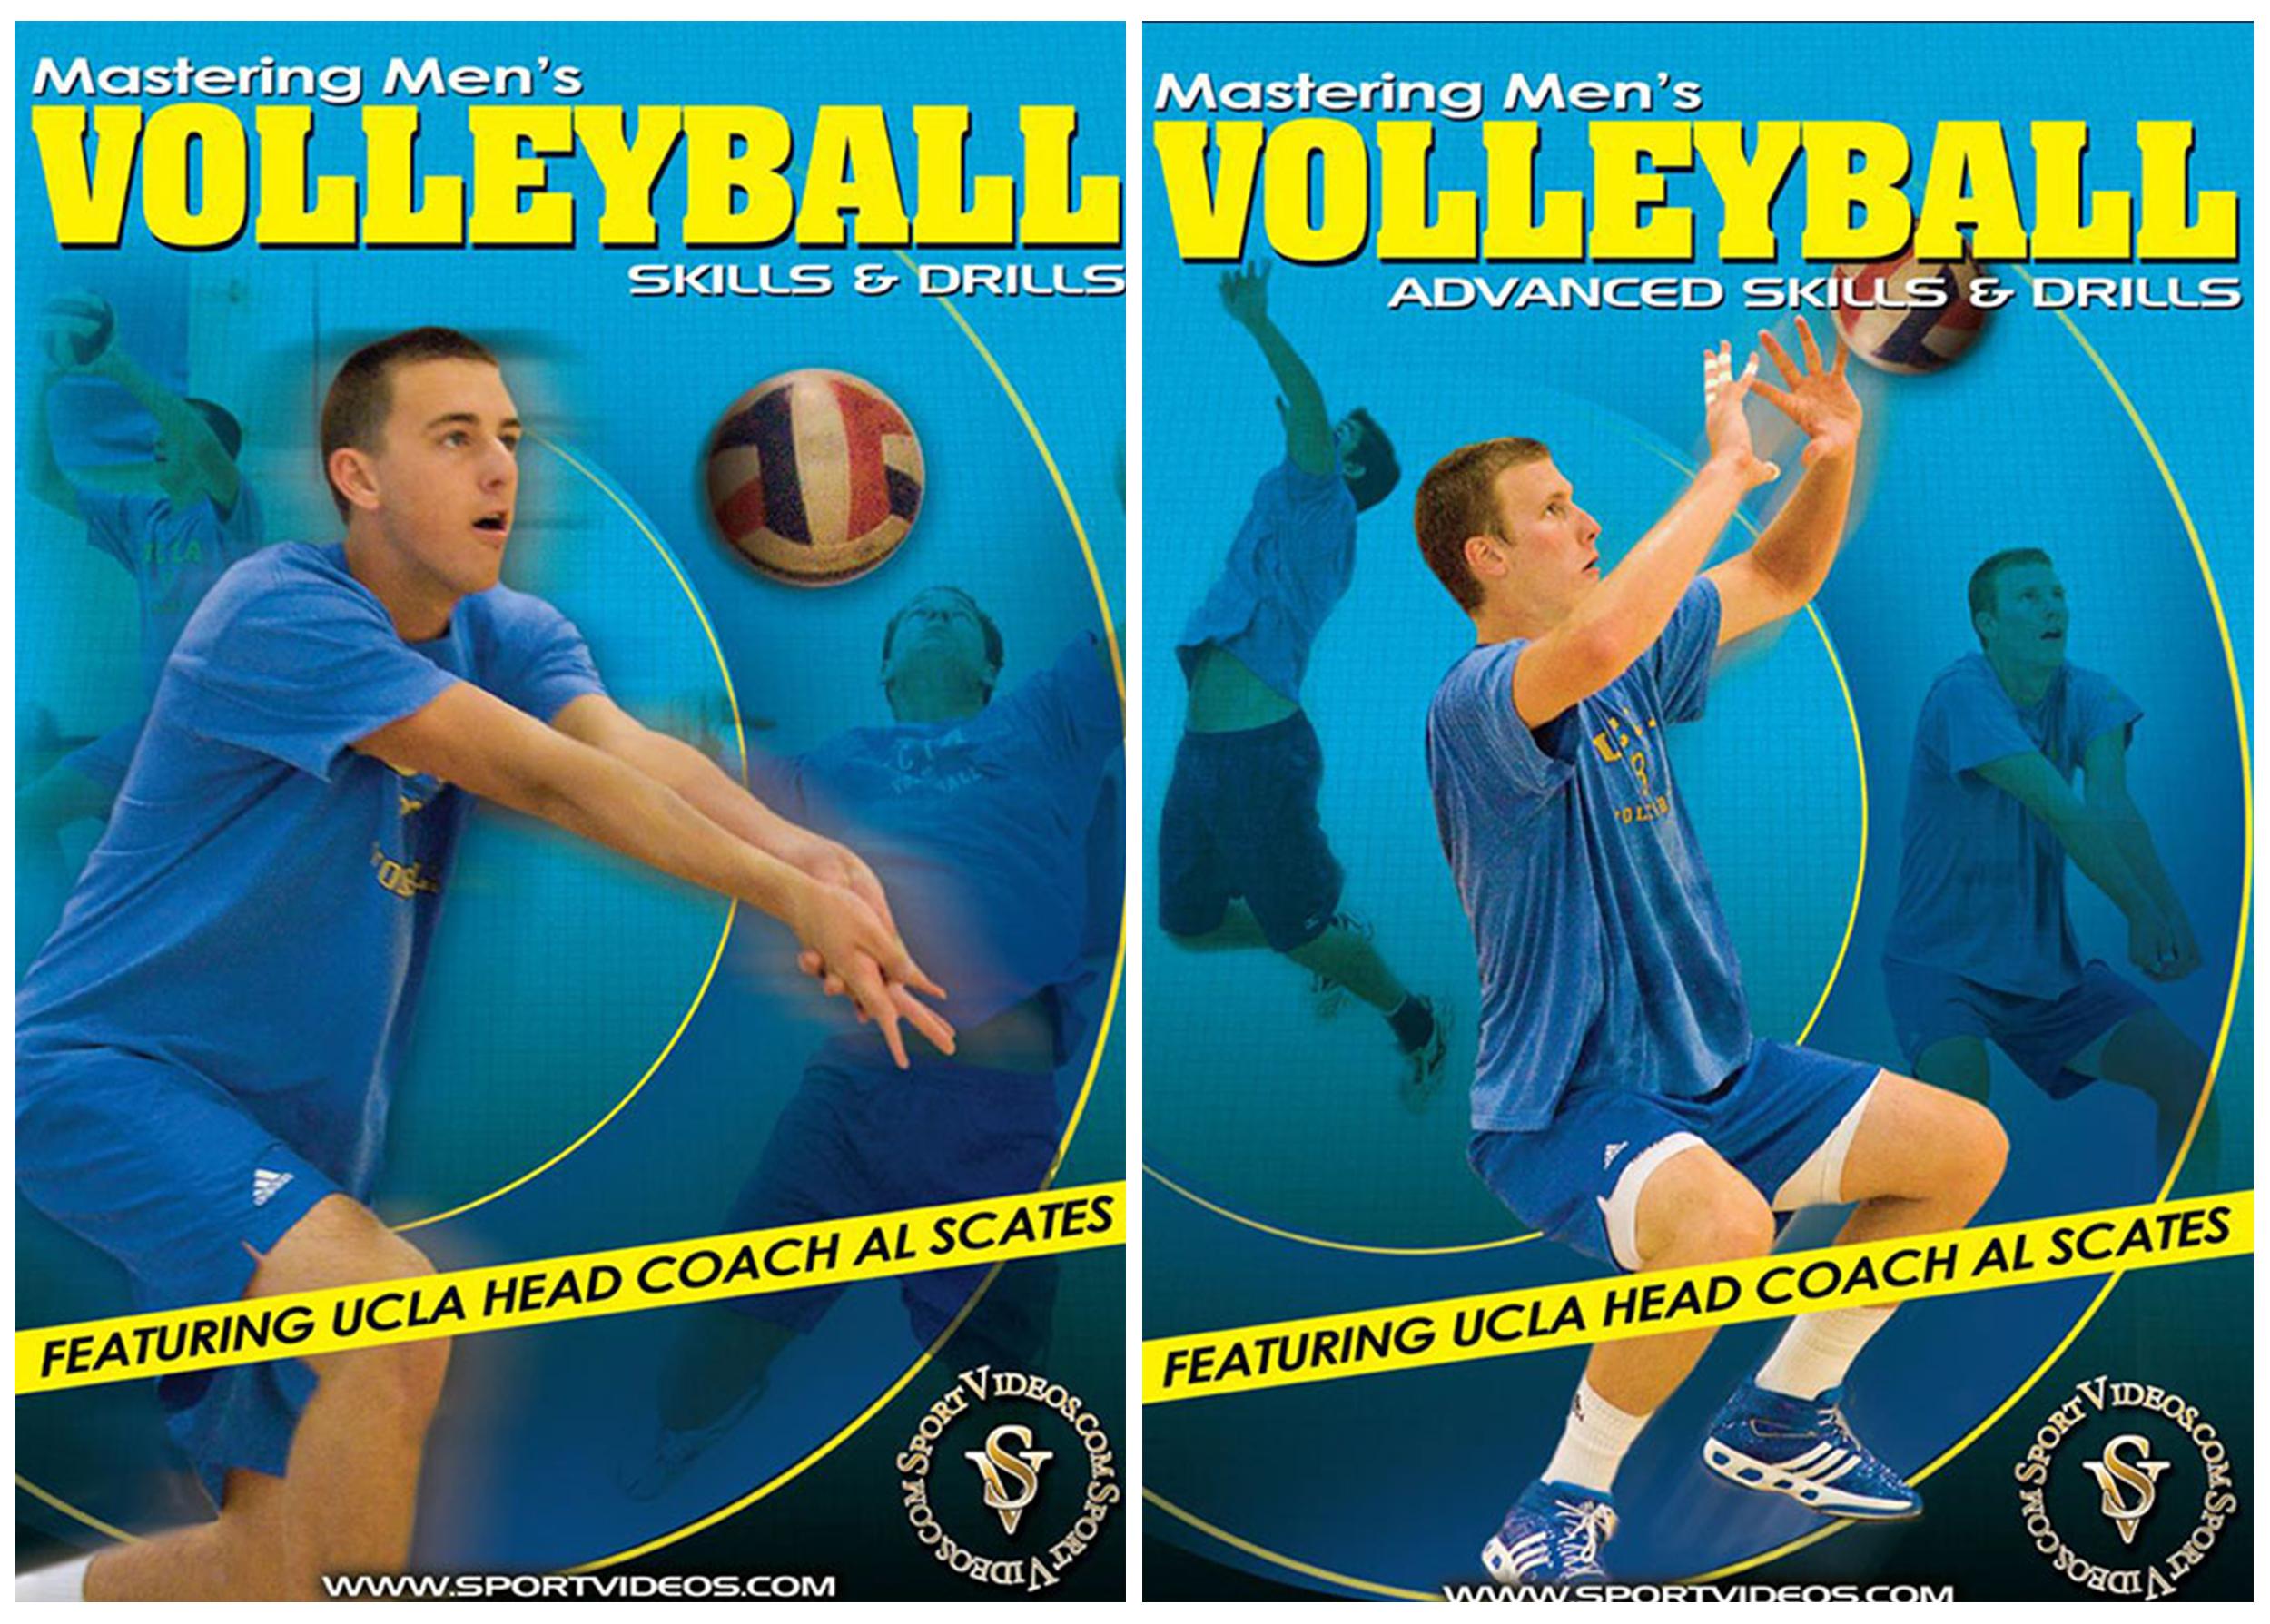 Mastering Men's Volleyball Skills and Drills 2 DVD Set